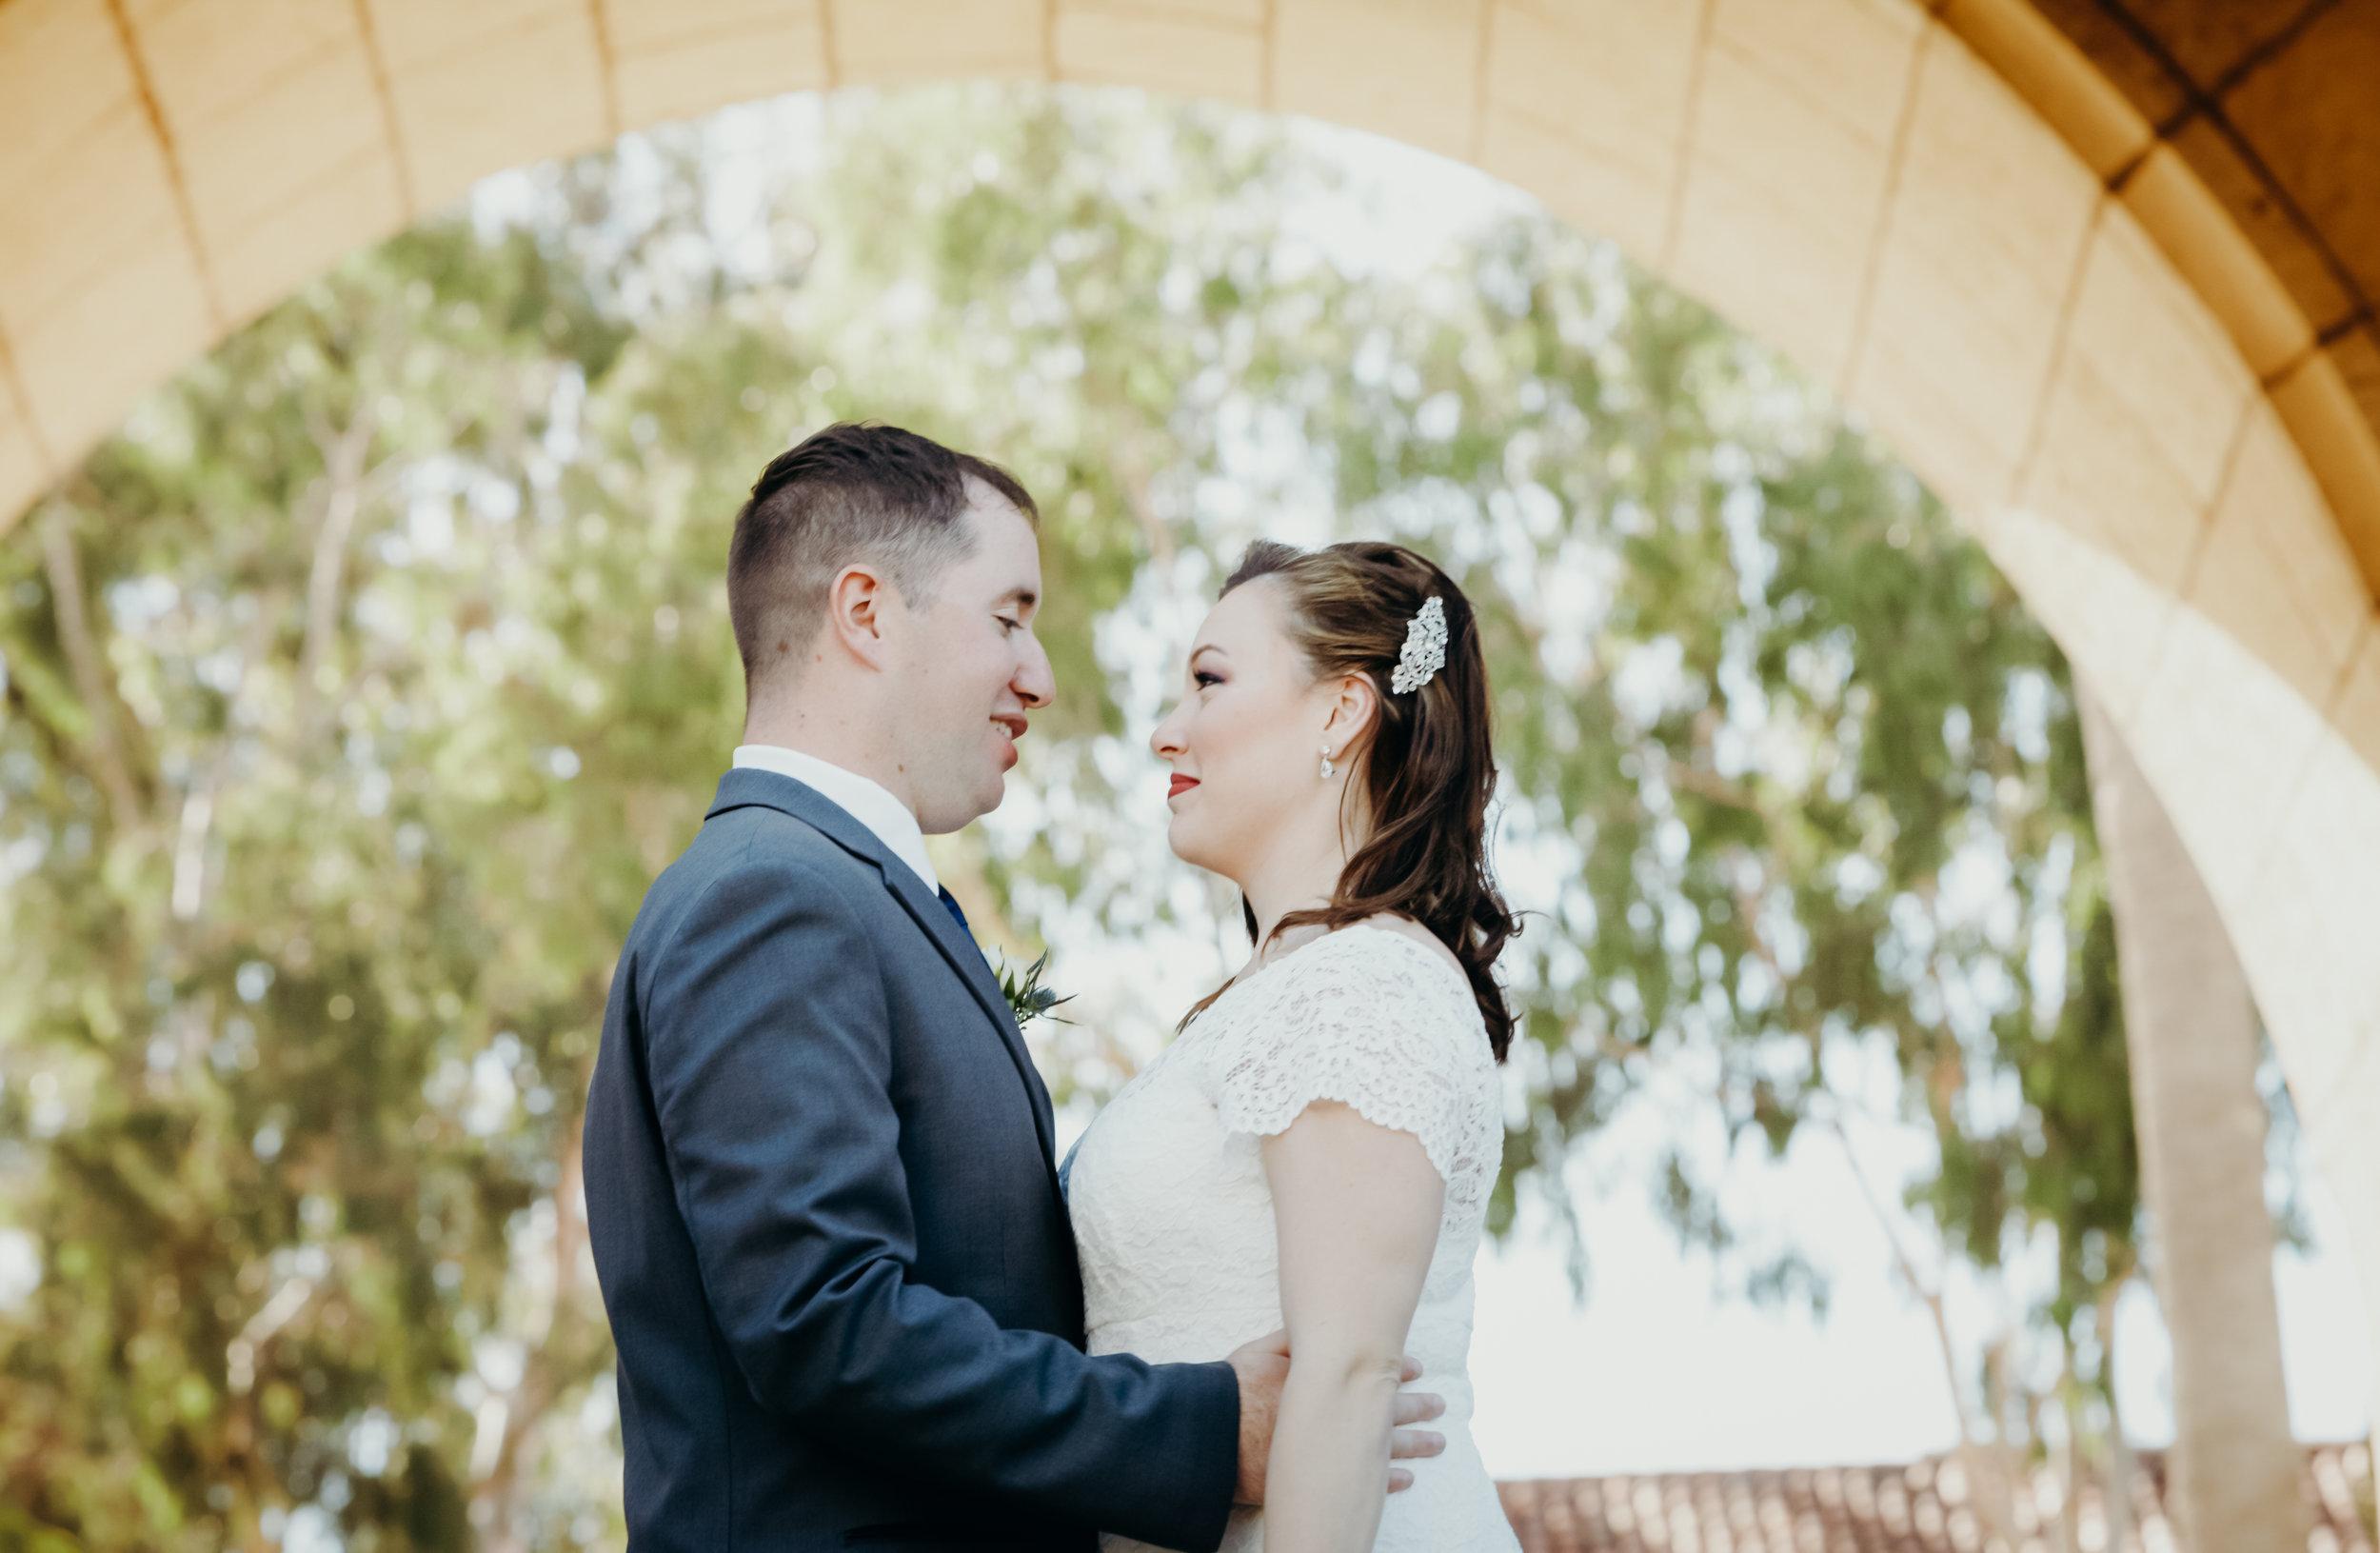 Gianna Keiko Atlanta Destination Wedding Elopement Photographer-15.jpg